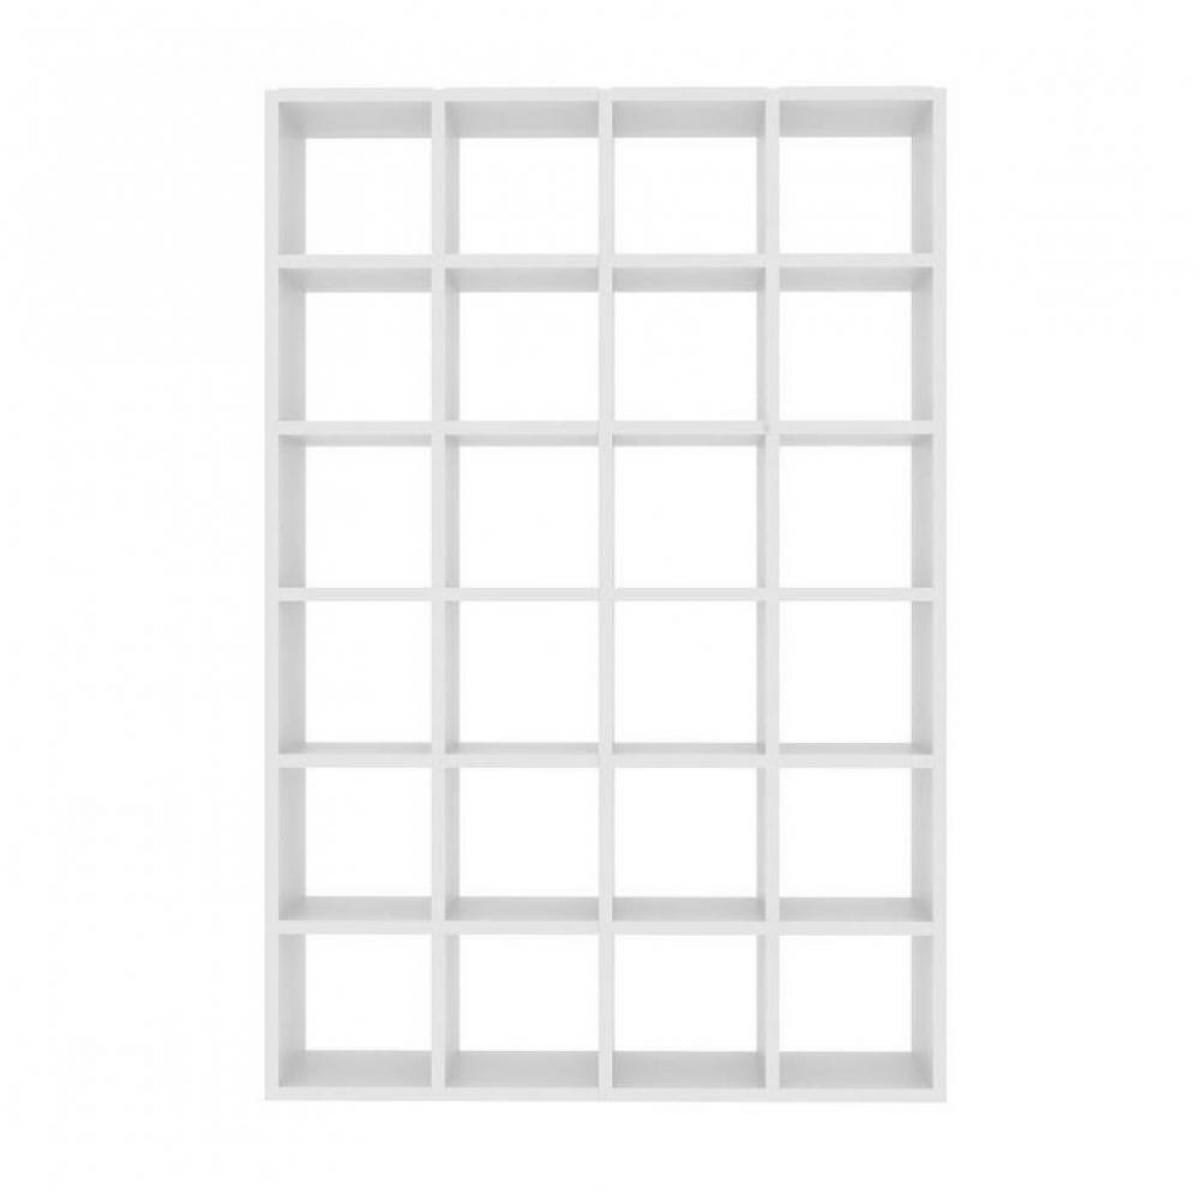 Inside 75 bookcases design POMBAL blanc 24 cases